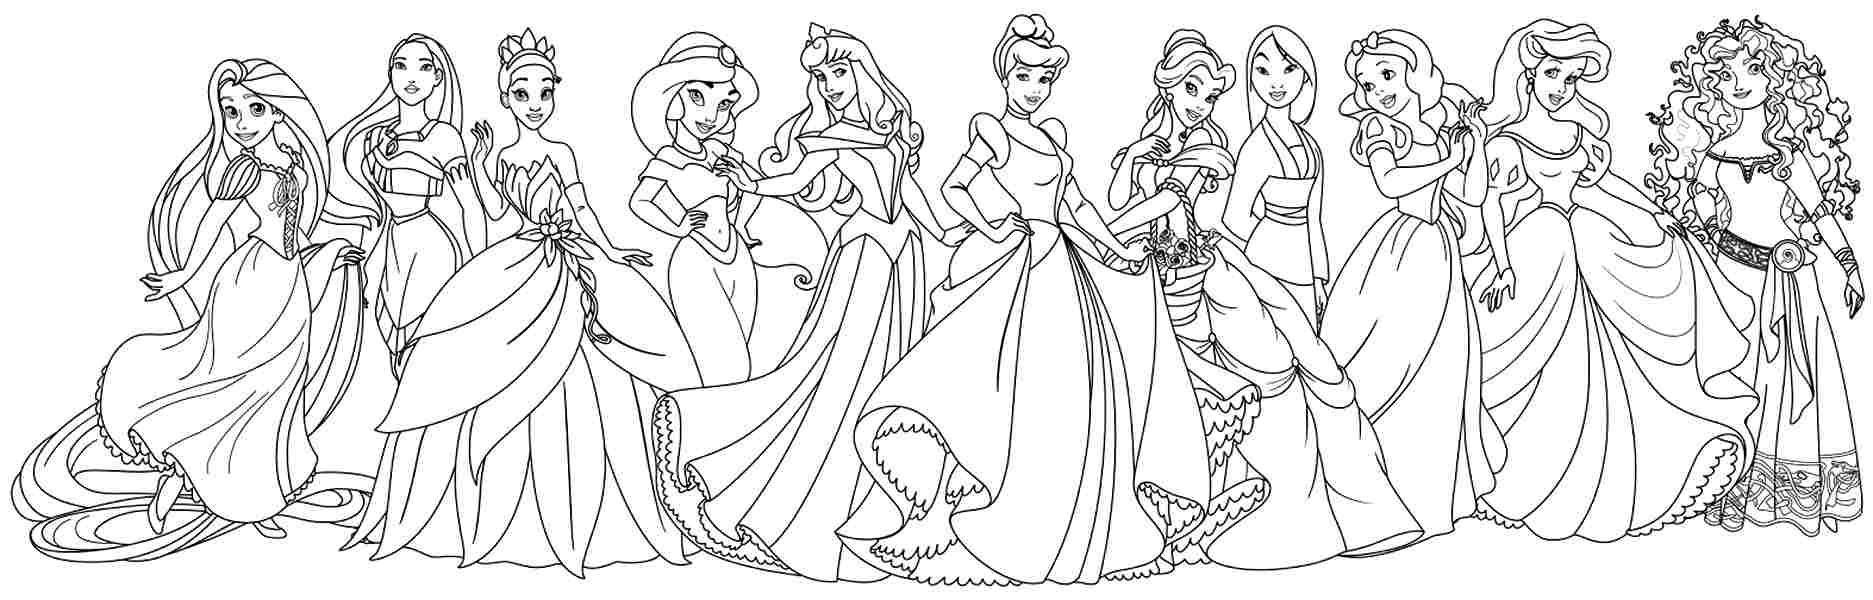 Disney Princess Coloring Pages